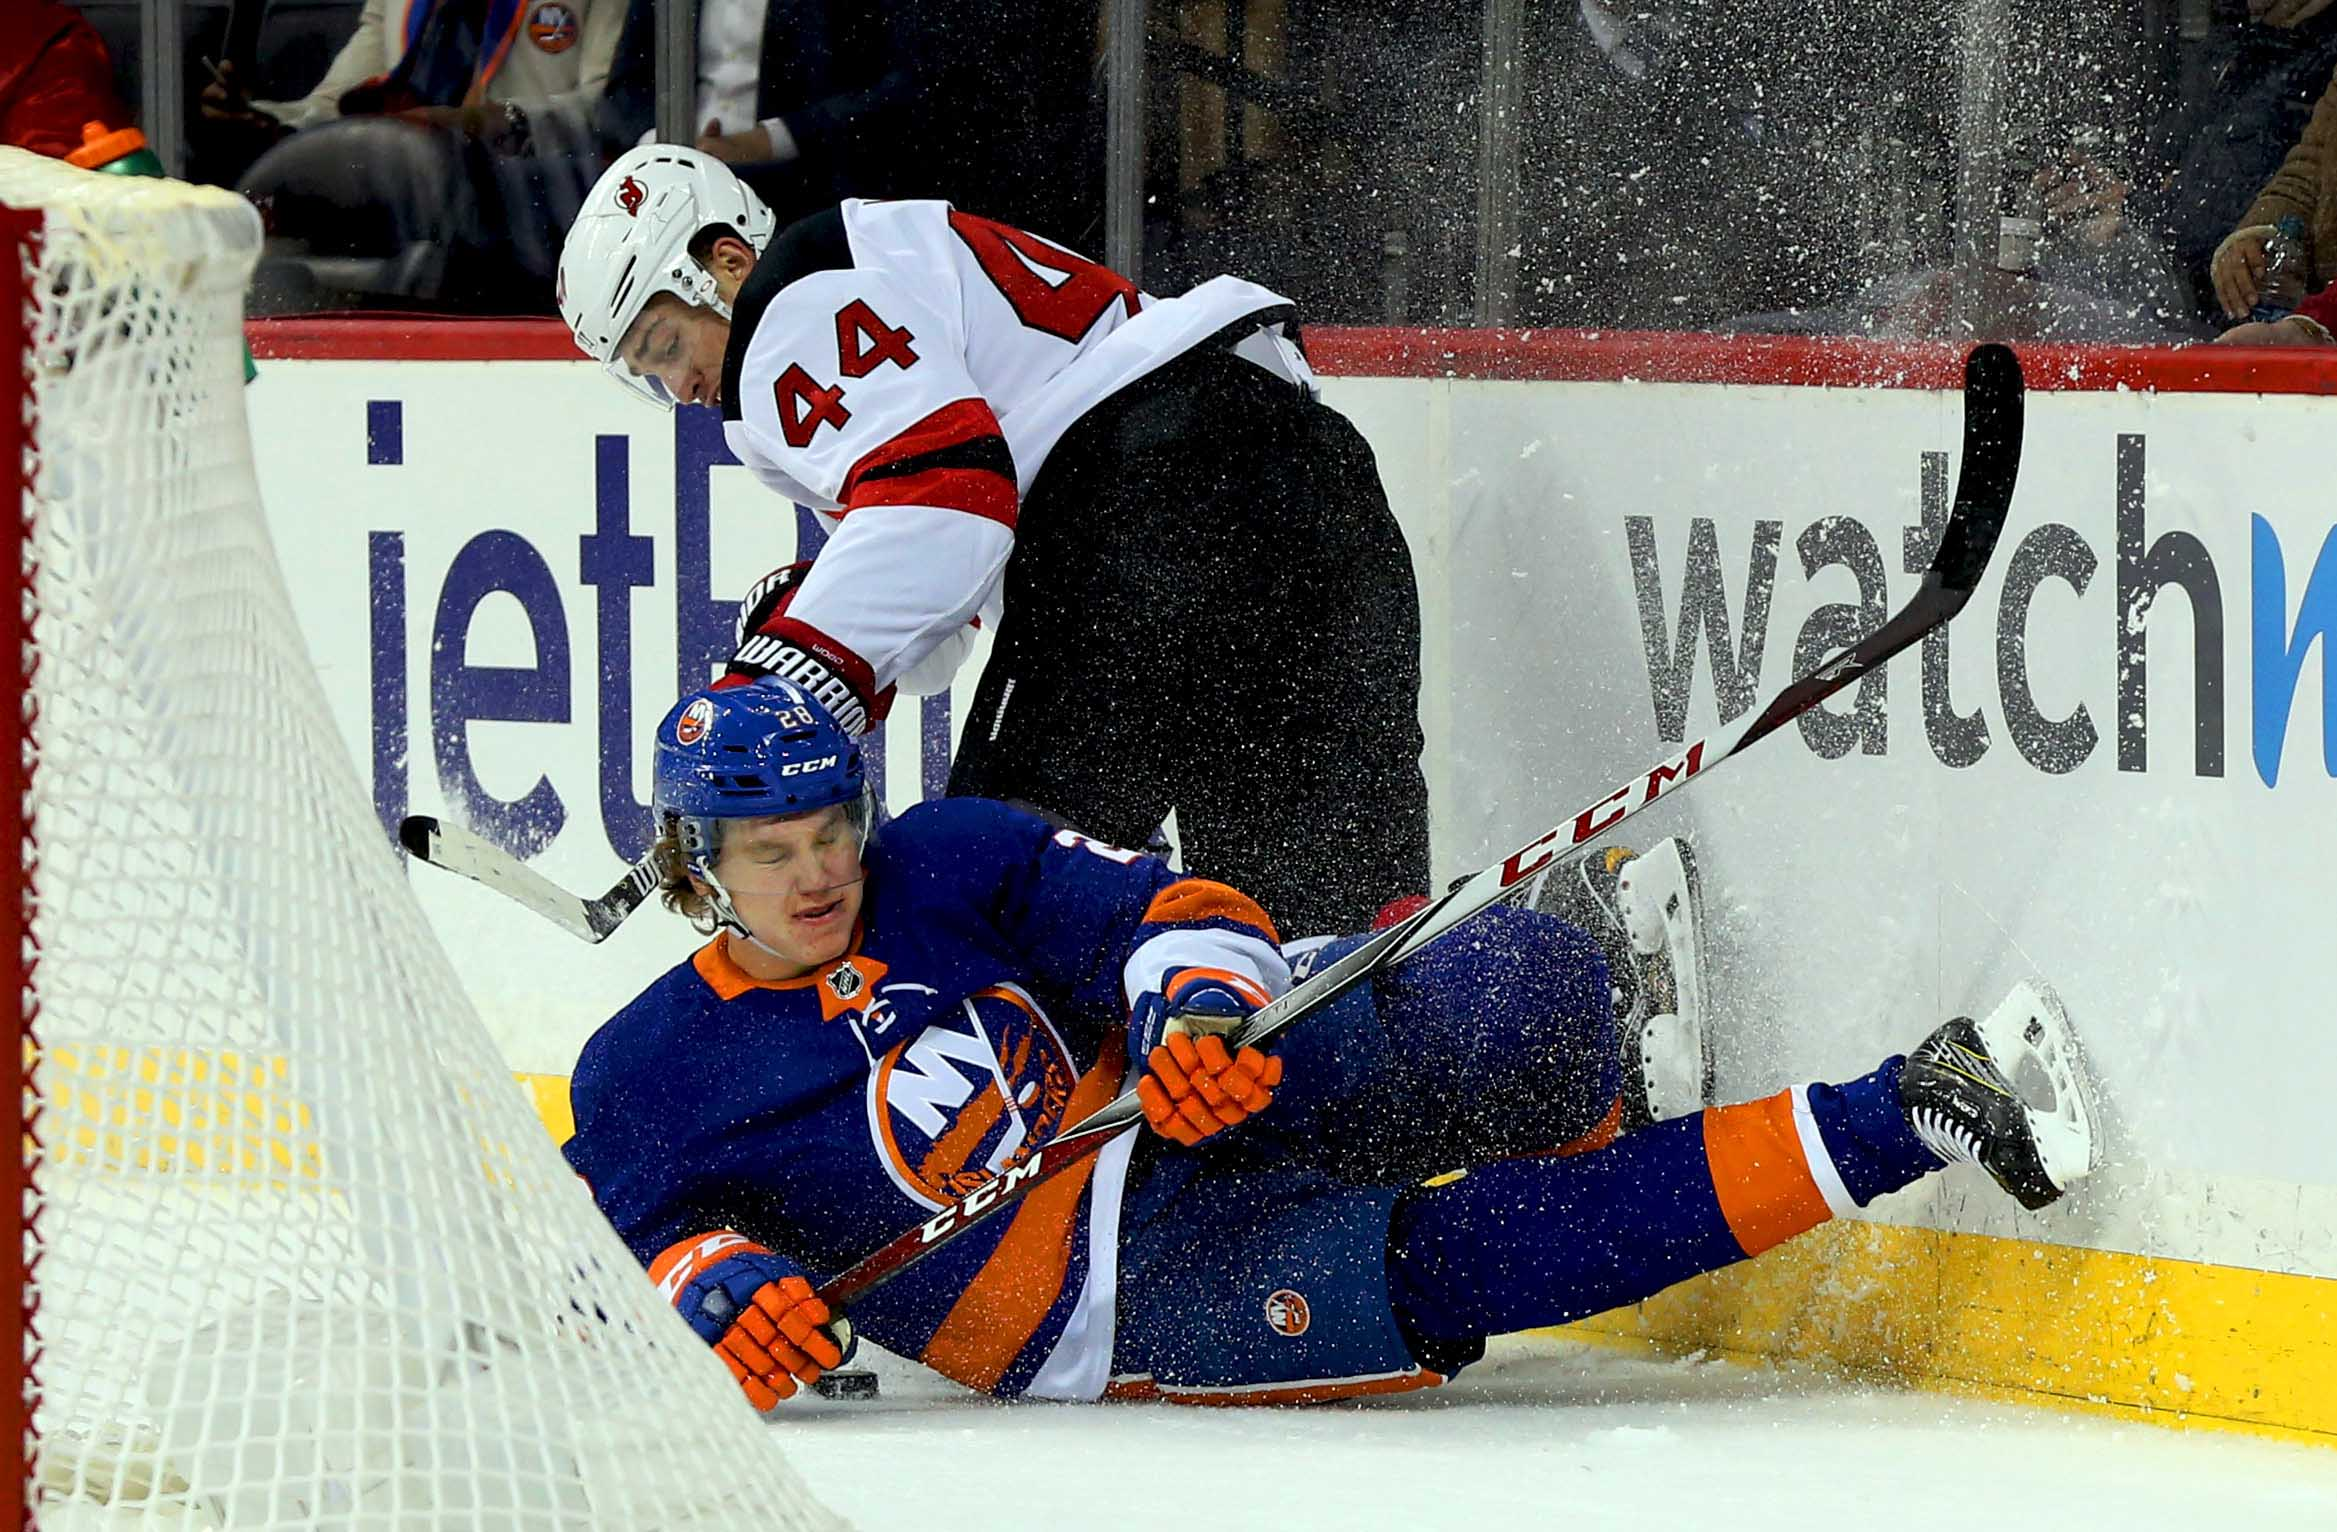 Islanders winning streak ends with 4-1 loss to Devils